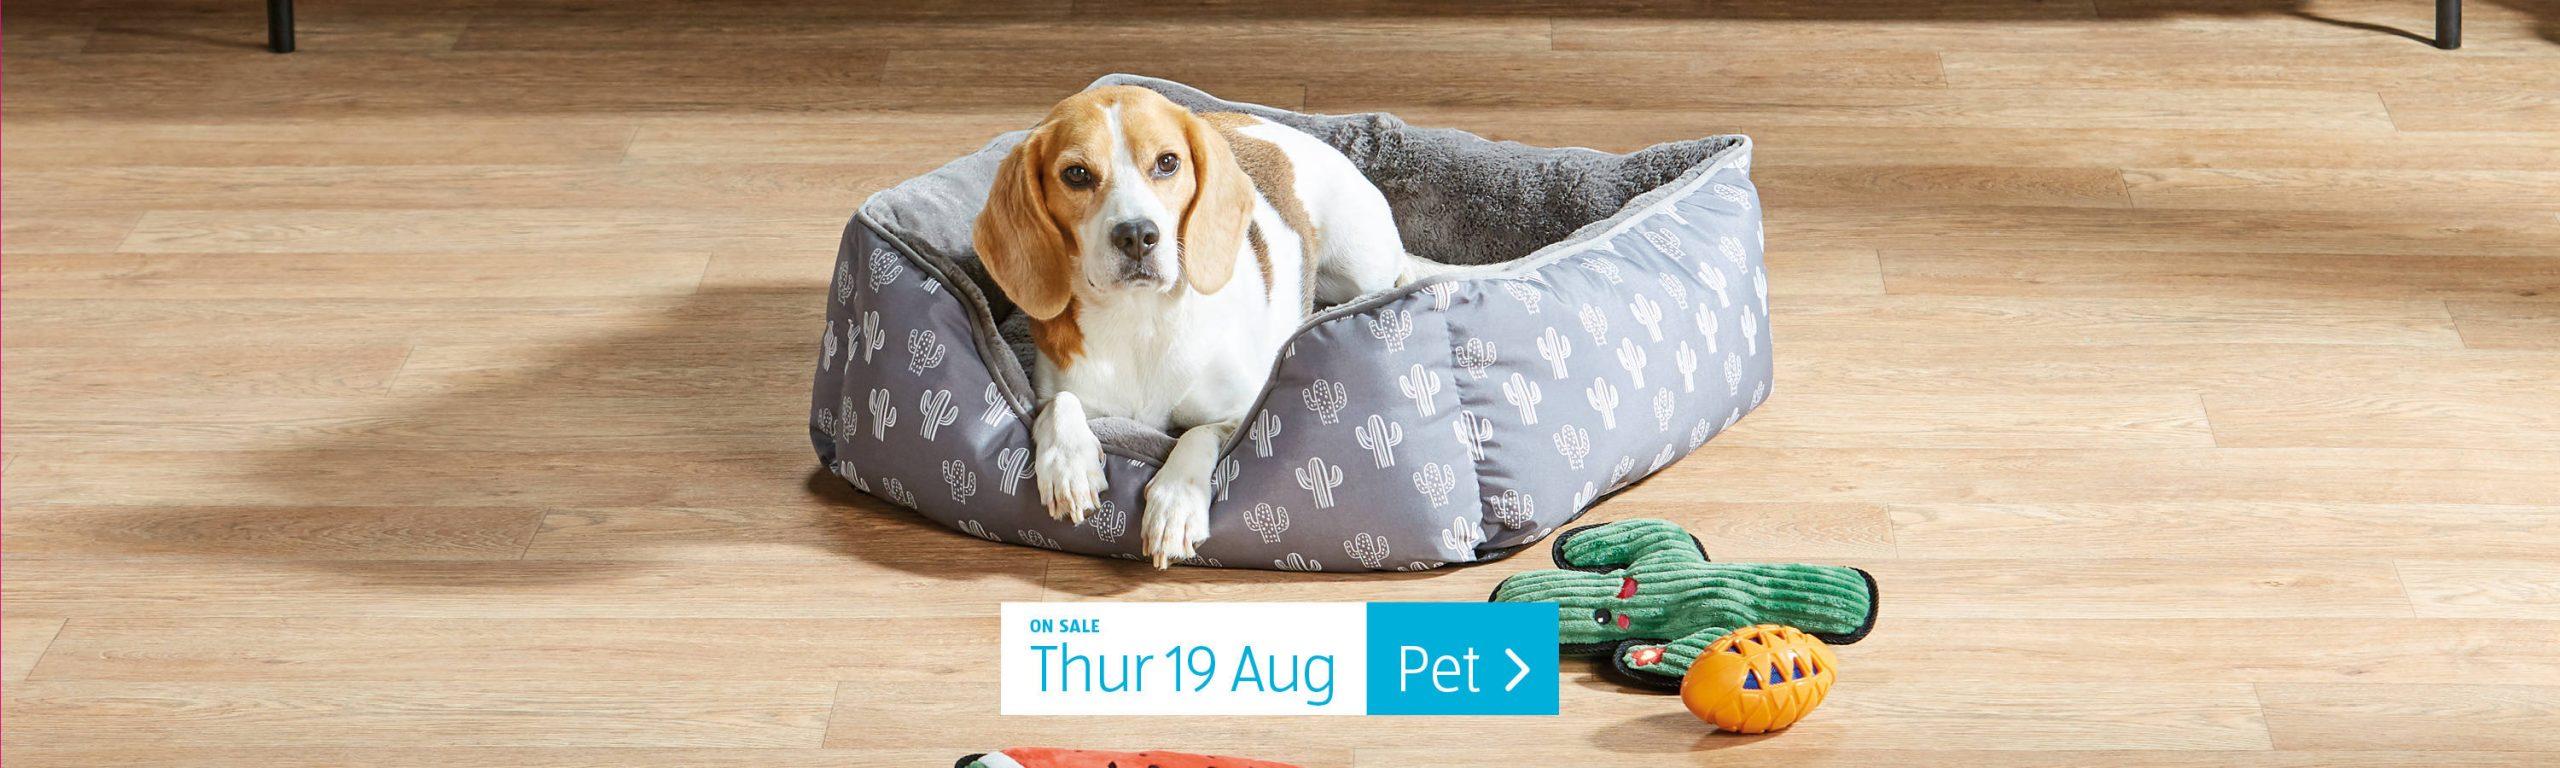 ALDI Thursday Offers 19th August 2021 ALDI Pet